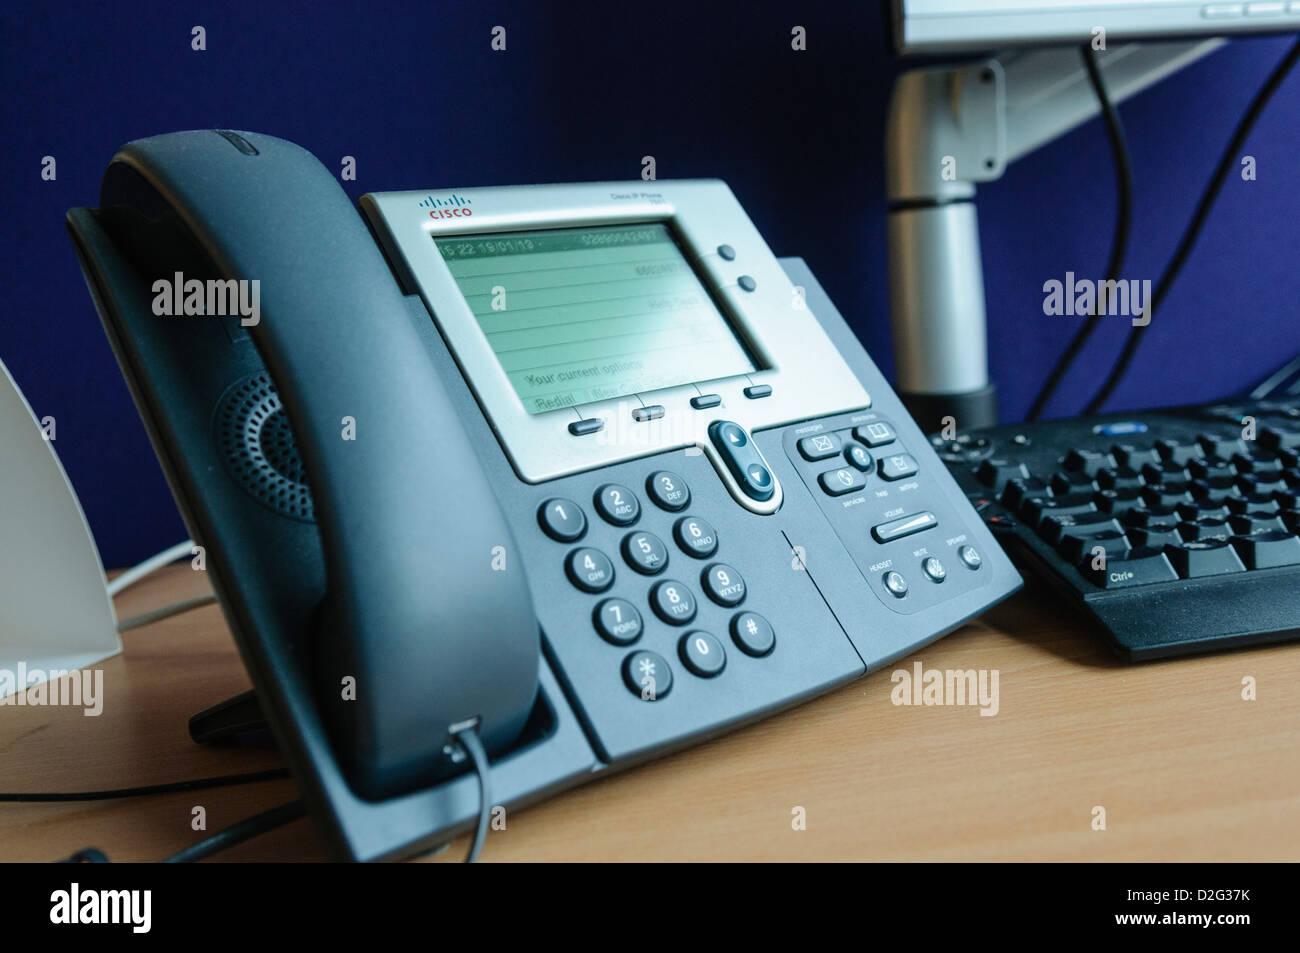 Cisco ip phone im genes de stock cisco ip phone fotos de stock alamy - Telefono de oficina de ryanair ...